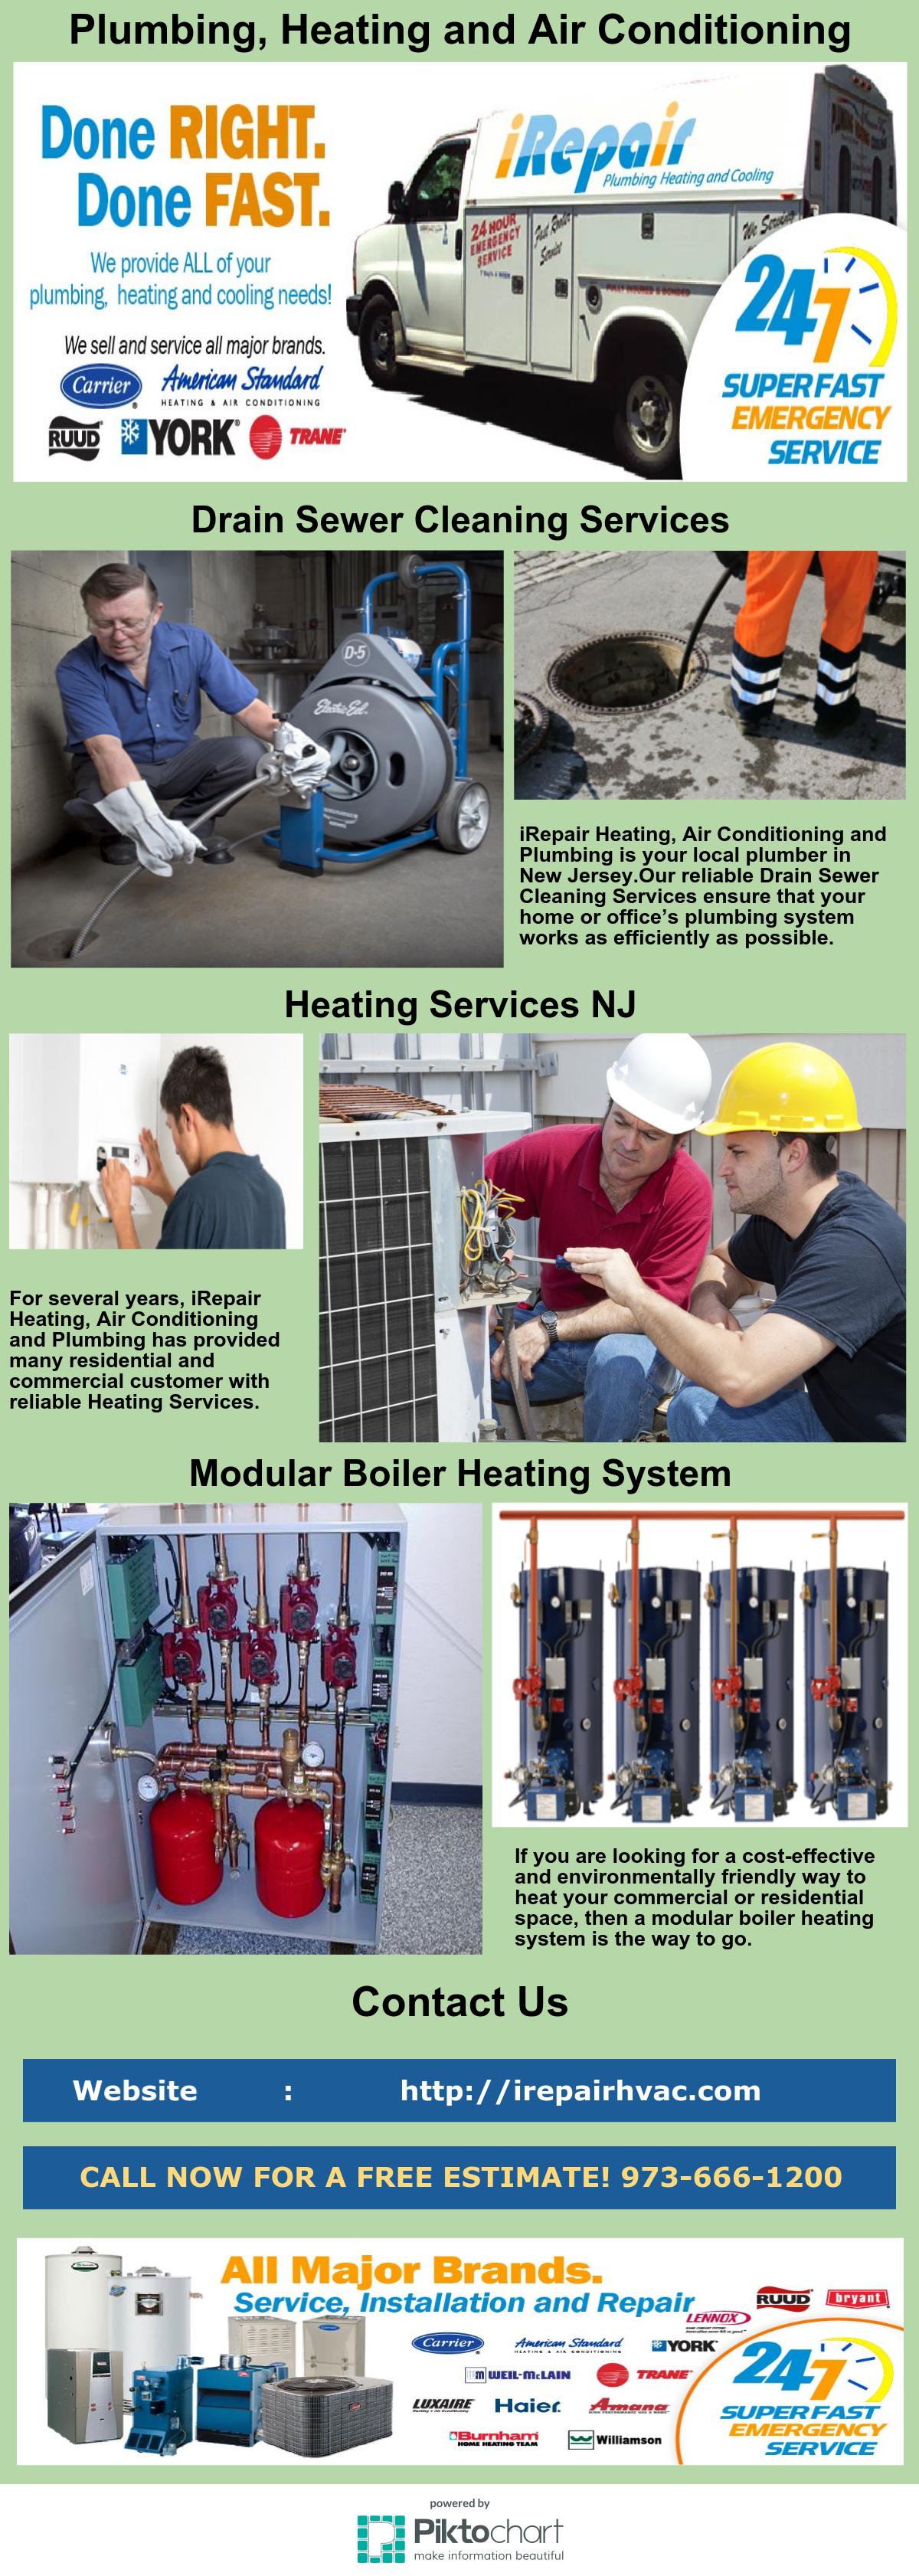 Heating Repair & Replacement New Jersey (NJ) Heating